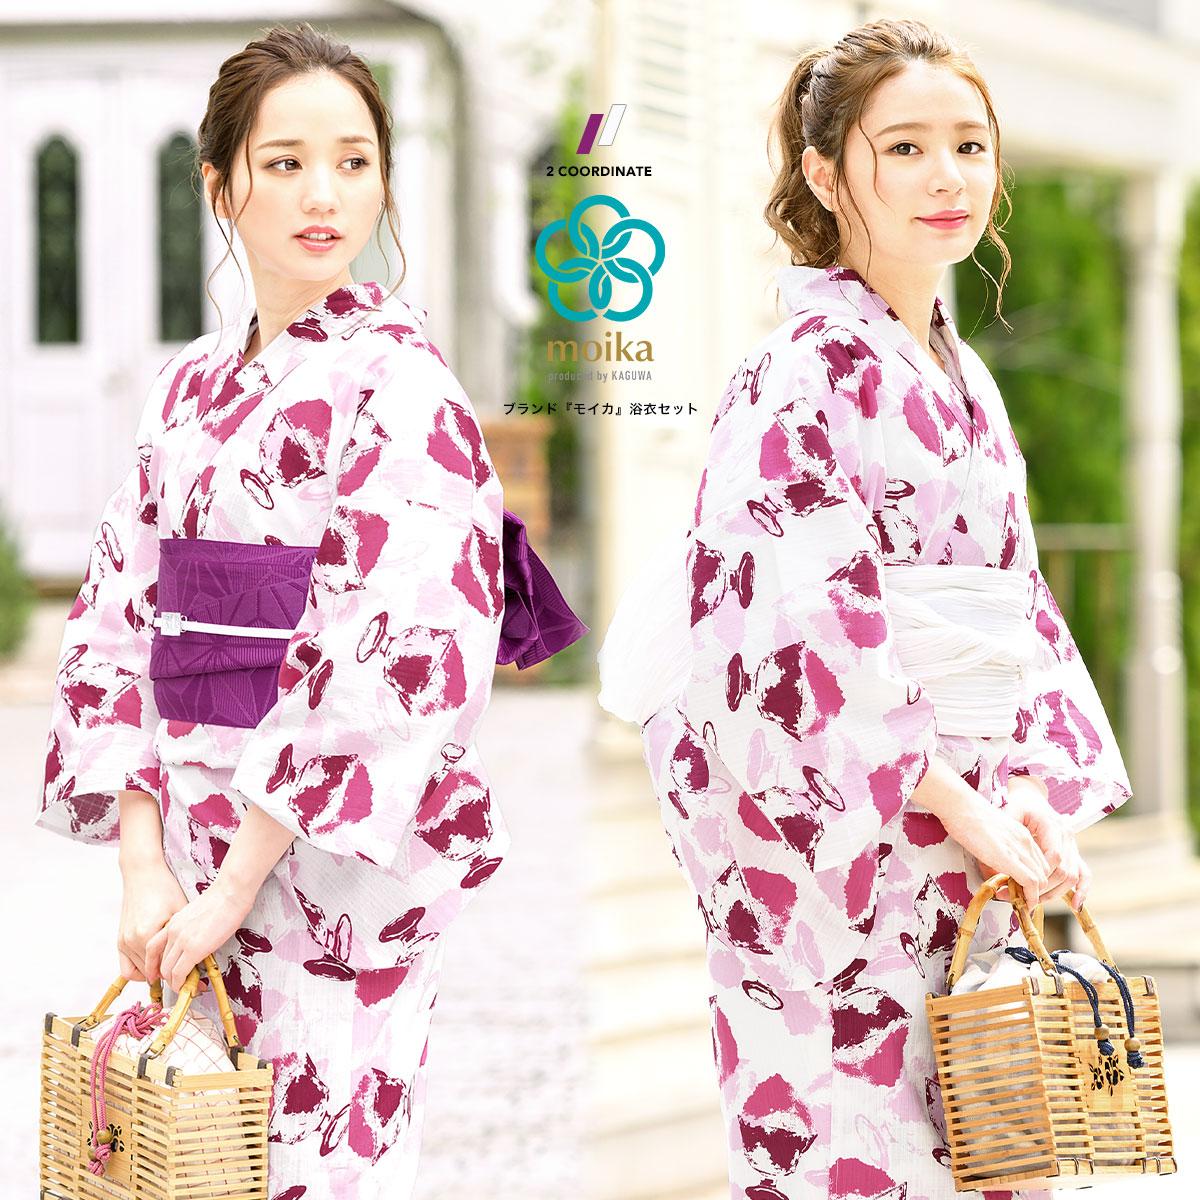 moika 浴衣 セット レディース 浴衣セット Mサイズ レトロ ピンク かき氷 衿芯付き 女性用 仕立て上がり